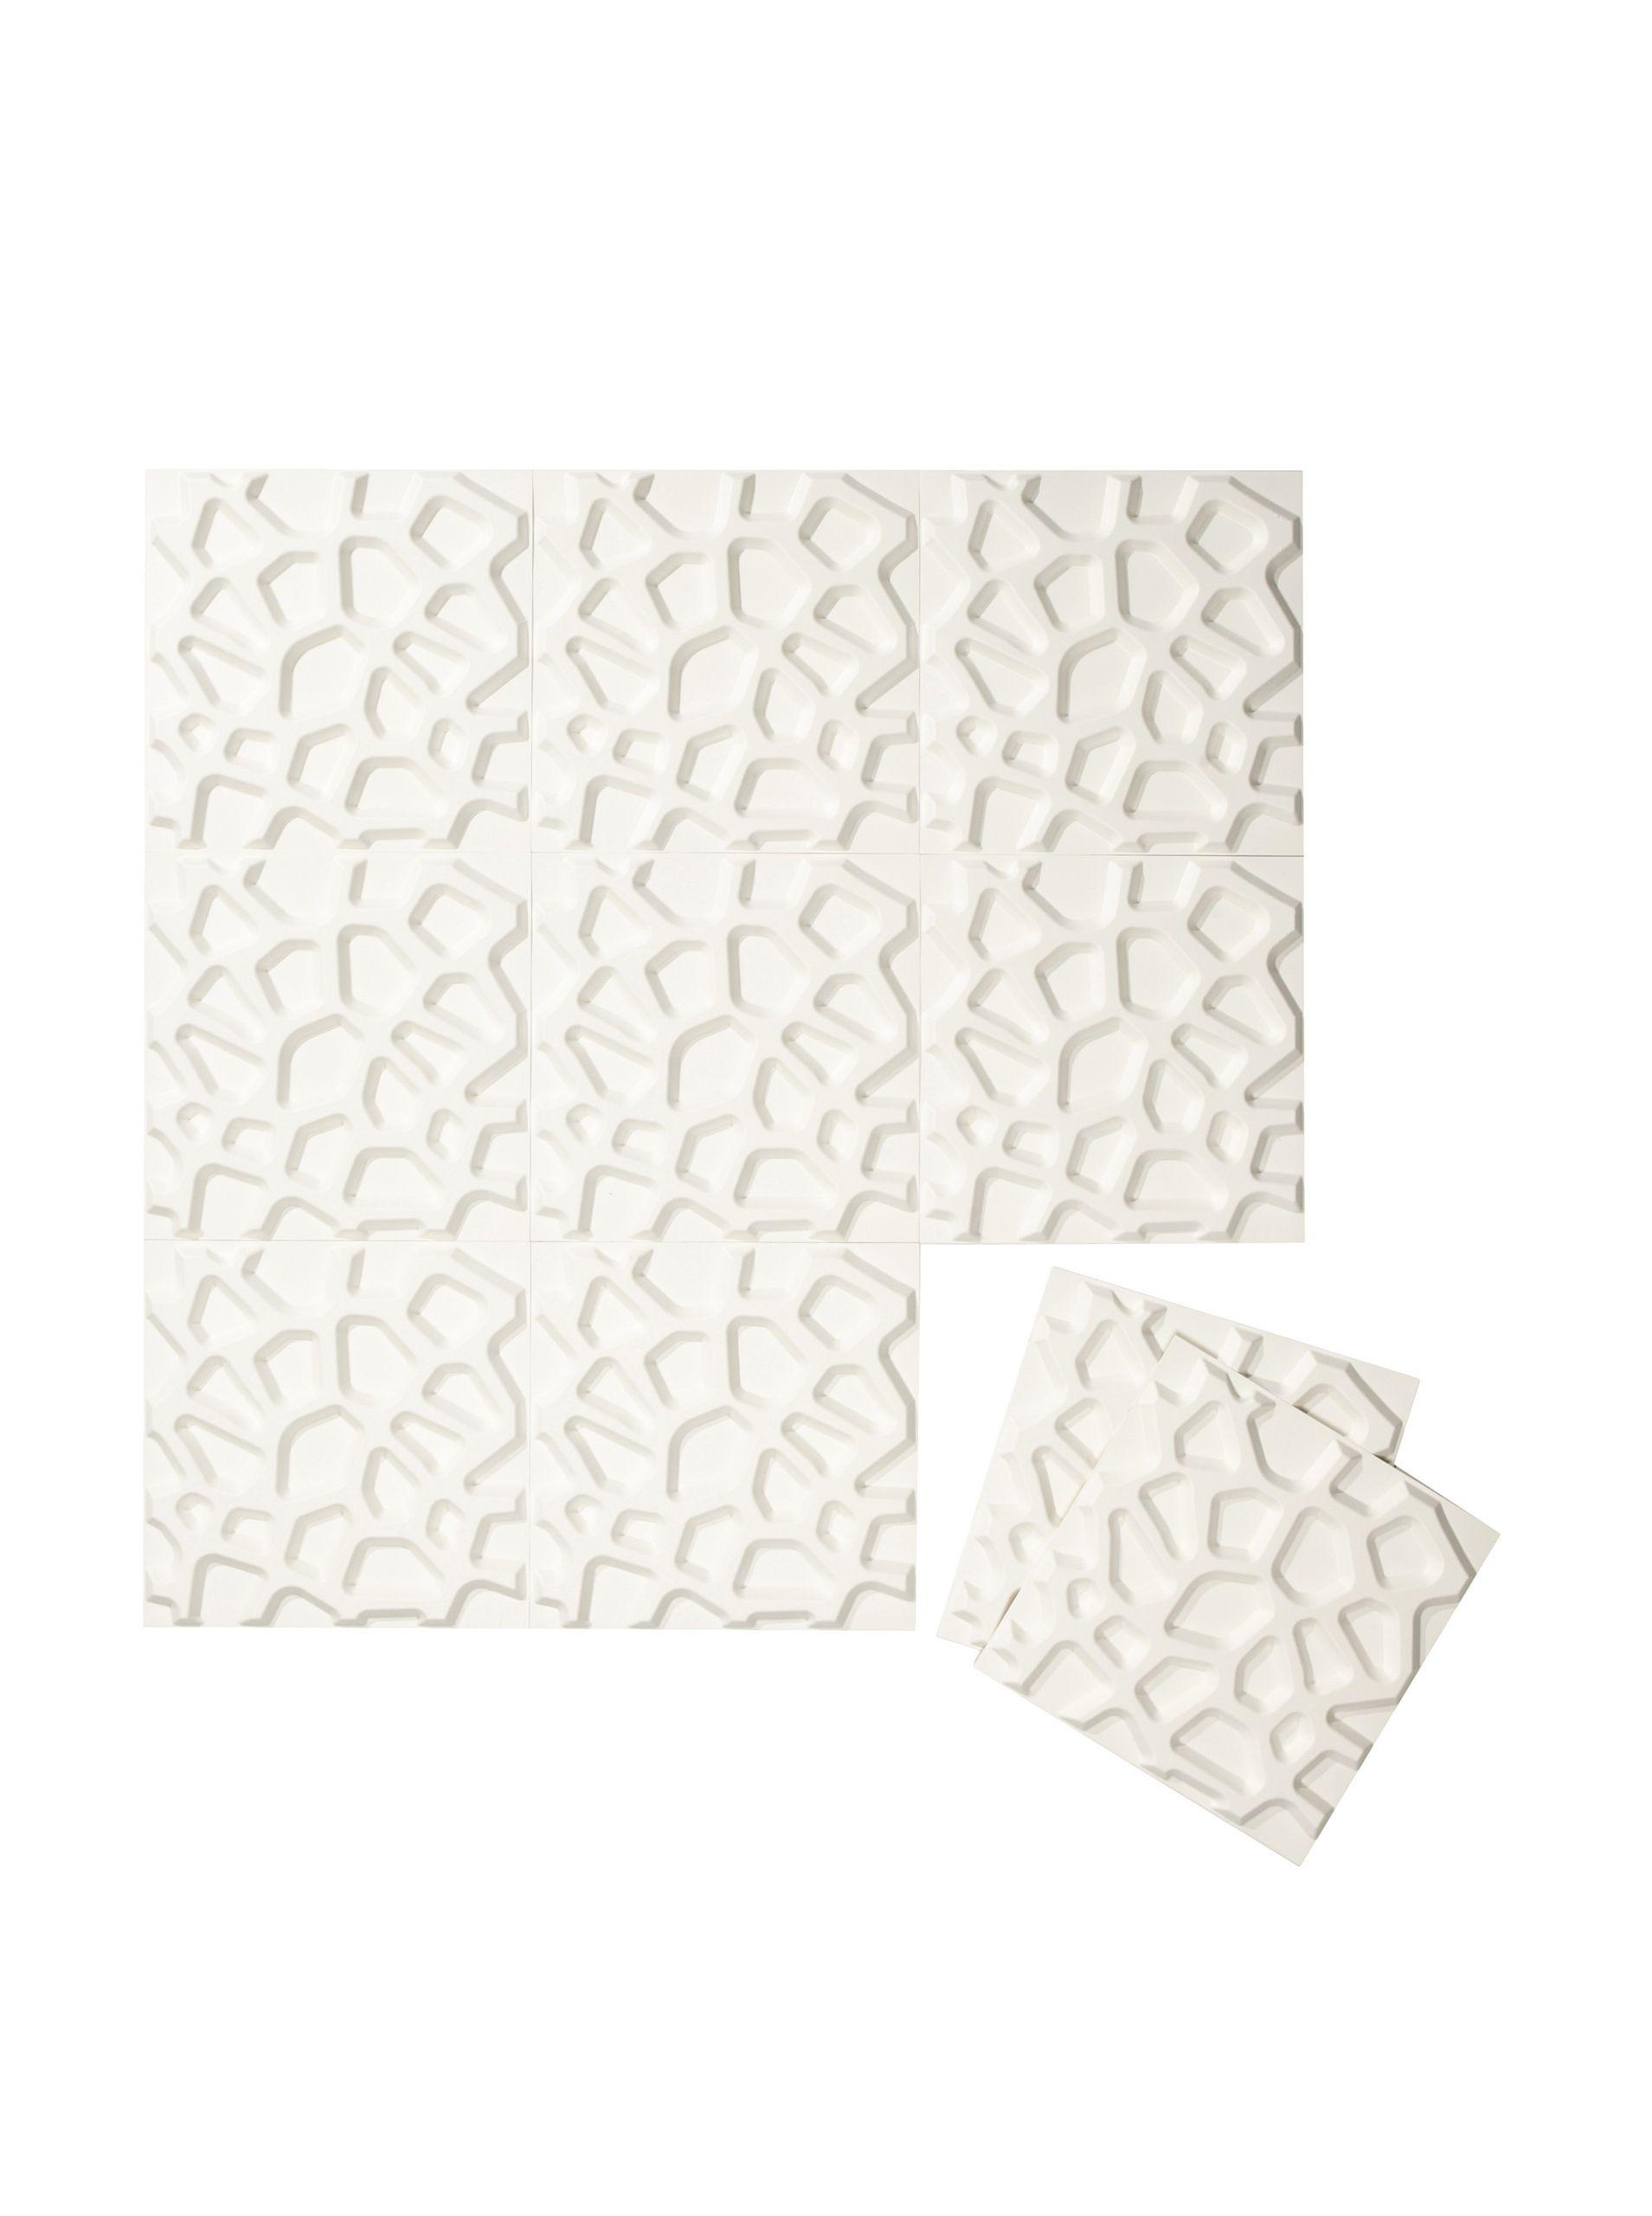 Amazon.com - Hive Wall Flats - 3D Textured Wall Panels - Wall ...